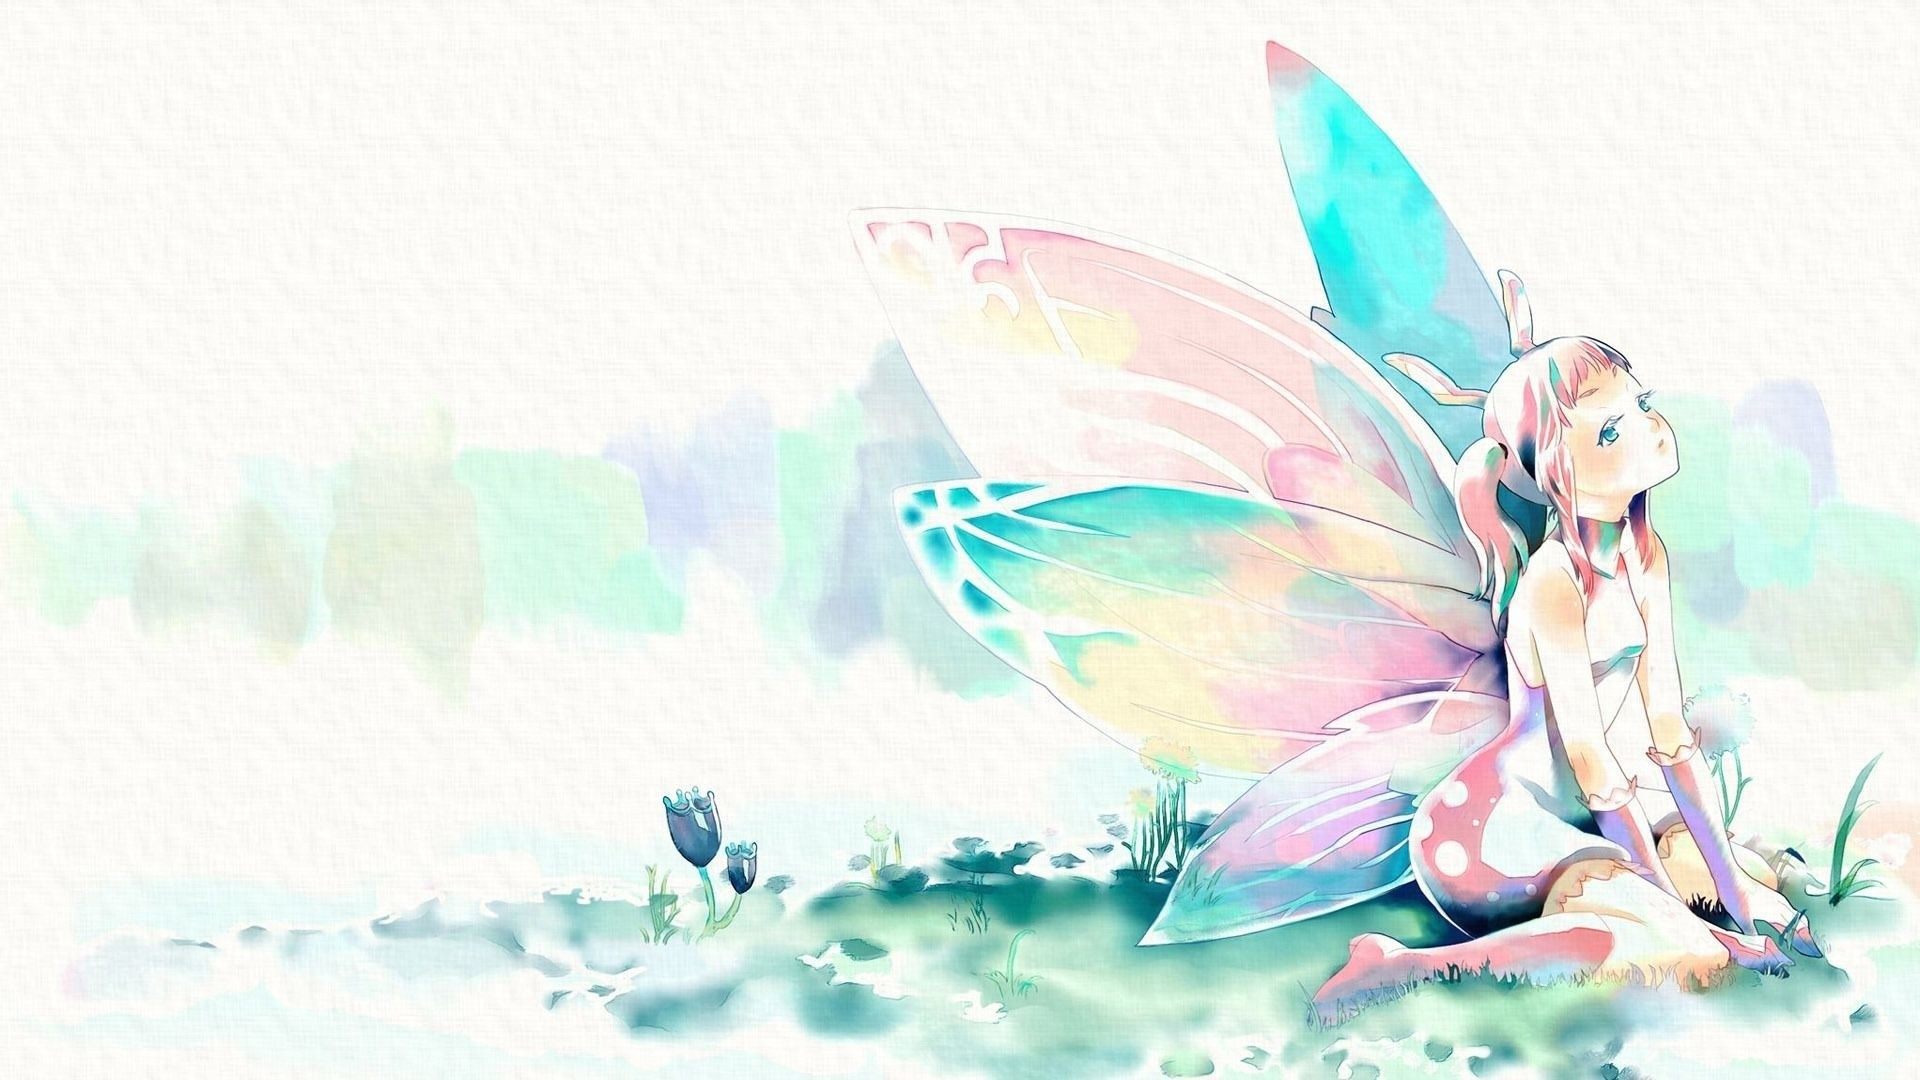 Fairy wallpaper photo hd